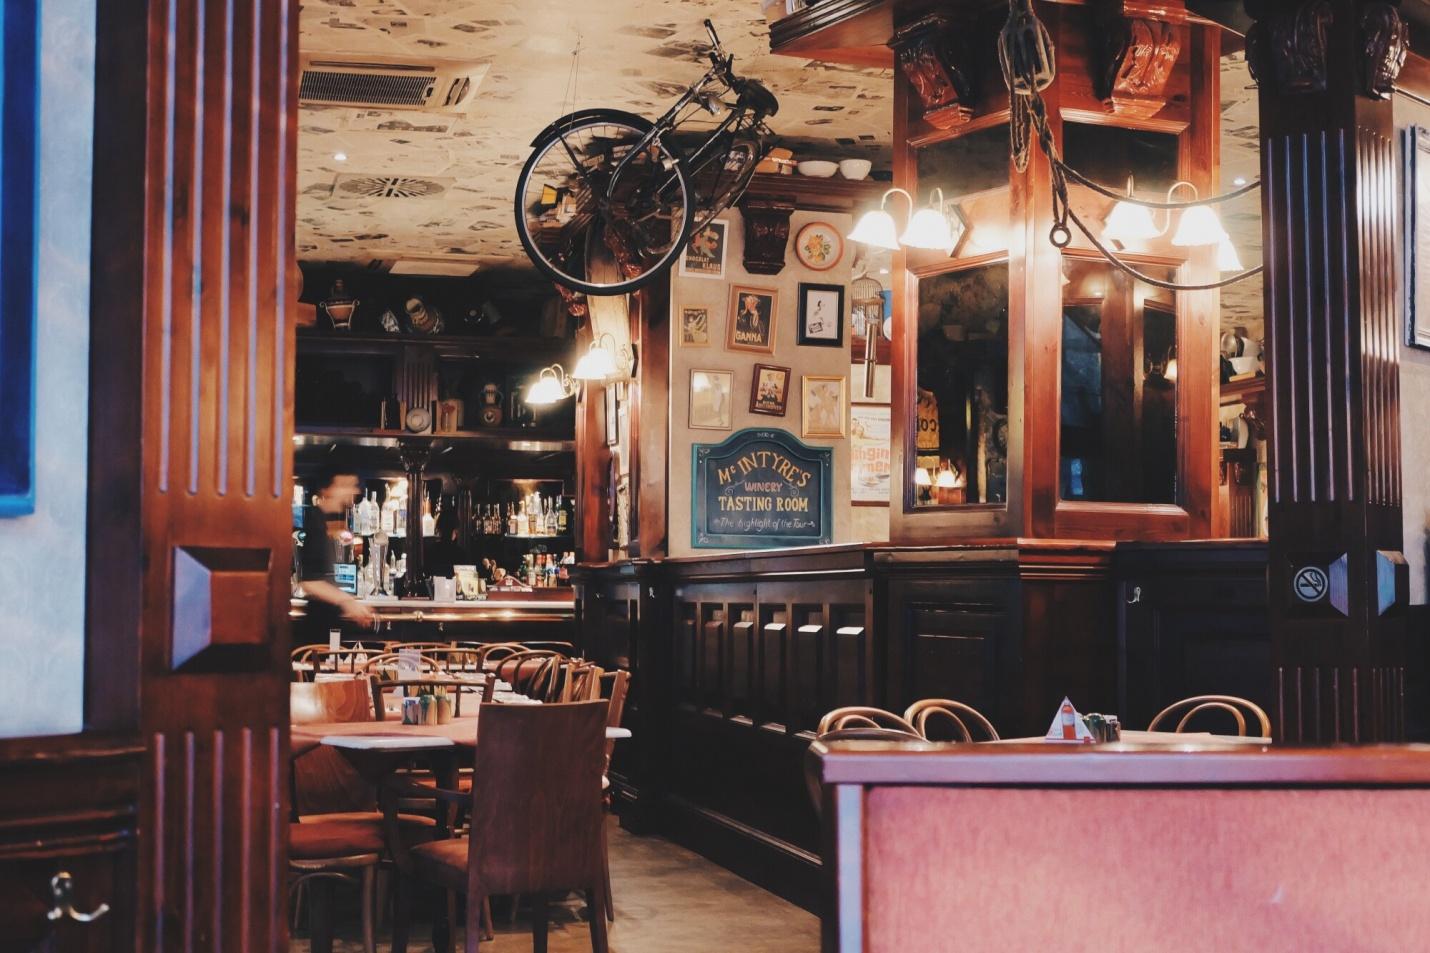 Restaurant Decor Ideas